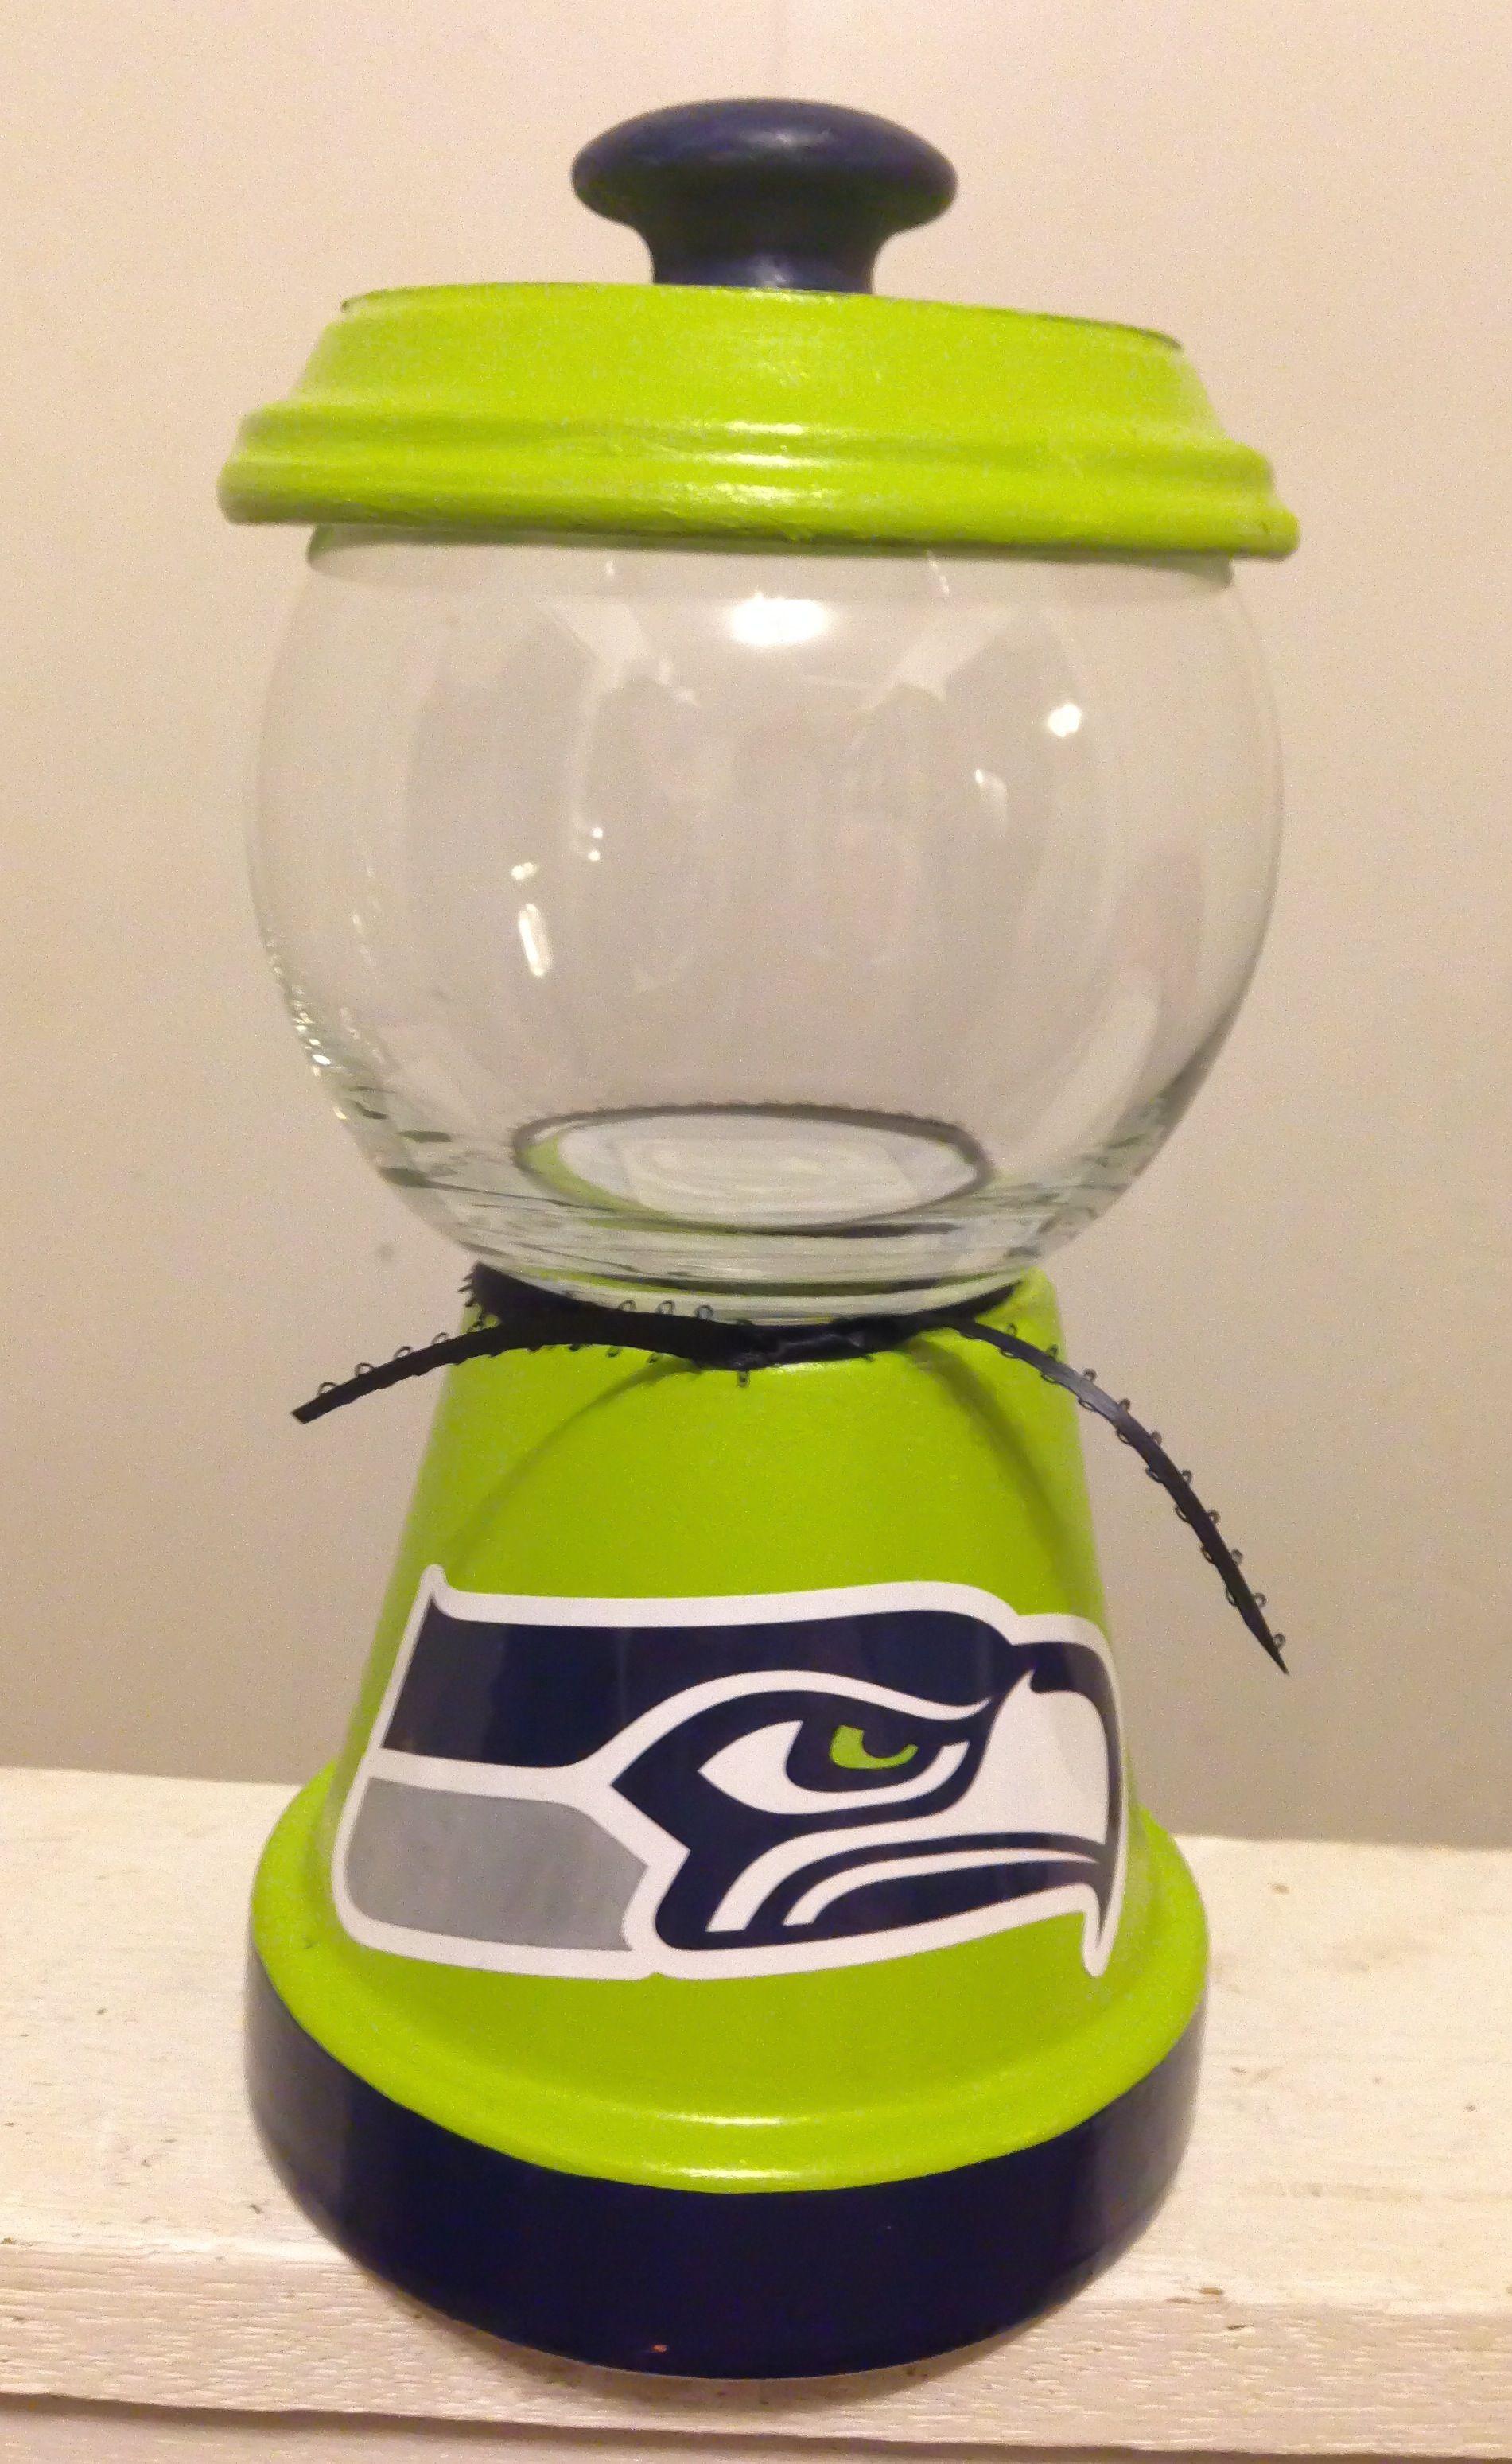 5d6f64aa8b Seattle Seahawks candy jar http   squareup.com market erica-